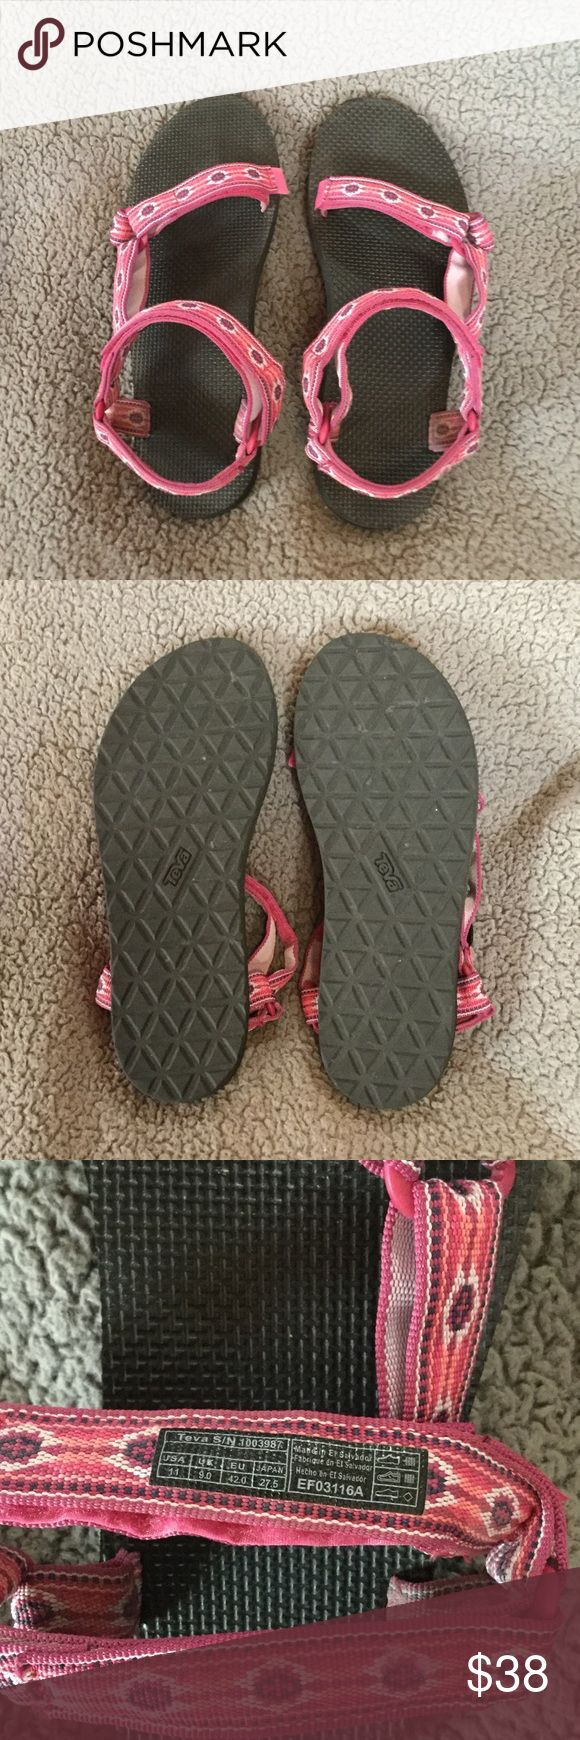 Teva Original Universe sandals Women's size 11 in Black Monterey Raspberry. Worn 3x. Excellent condition! Teva Shoes Sandals